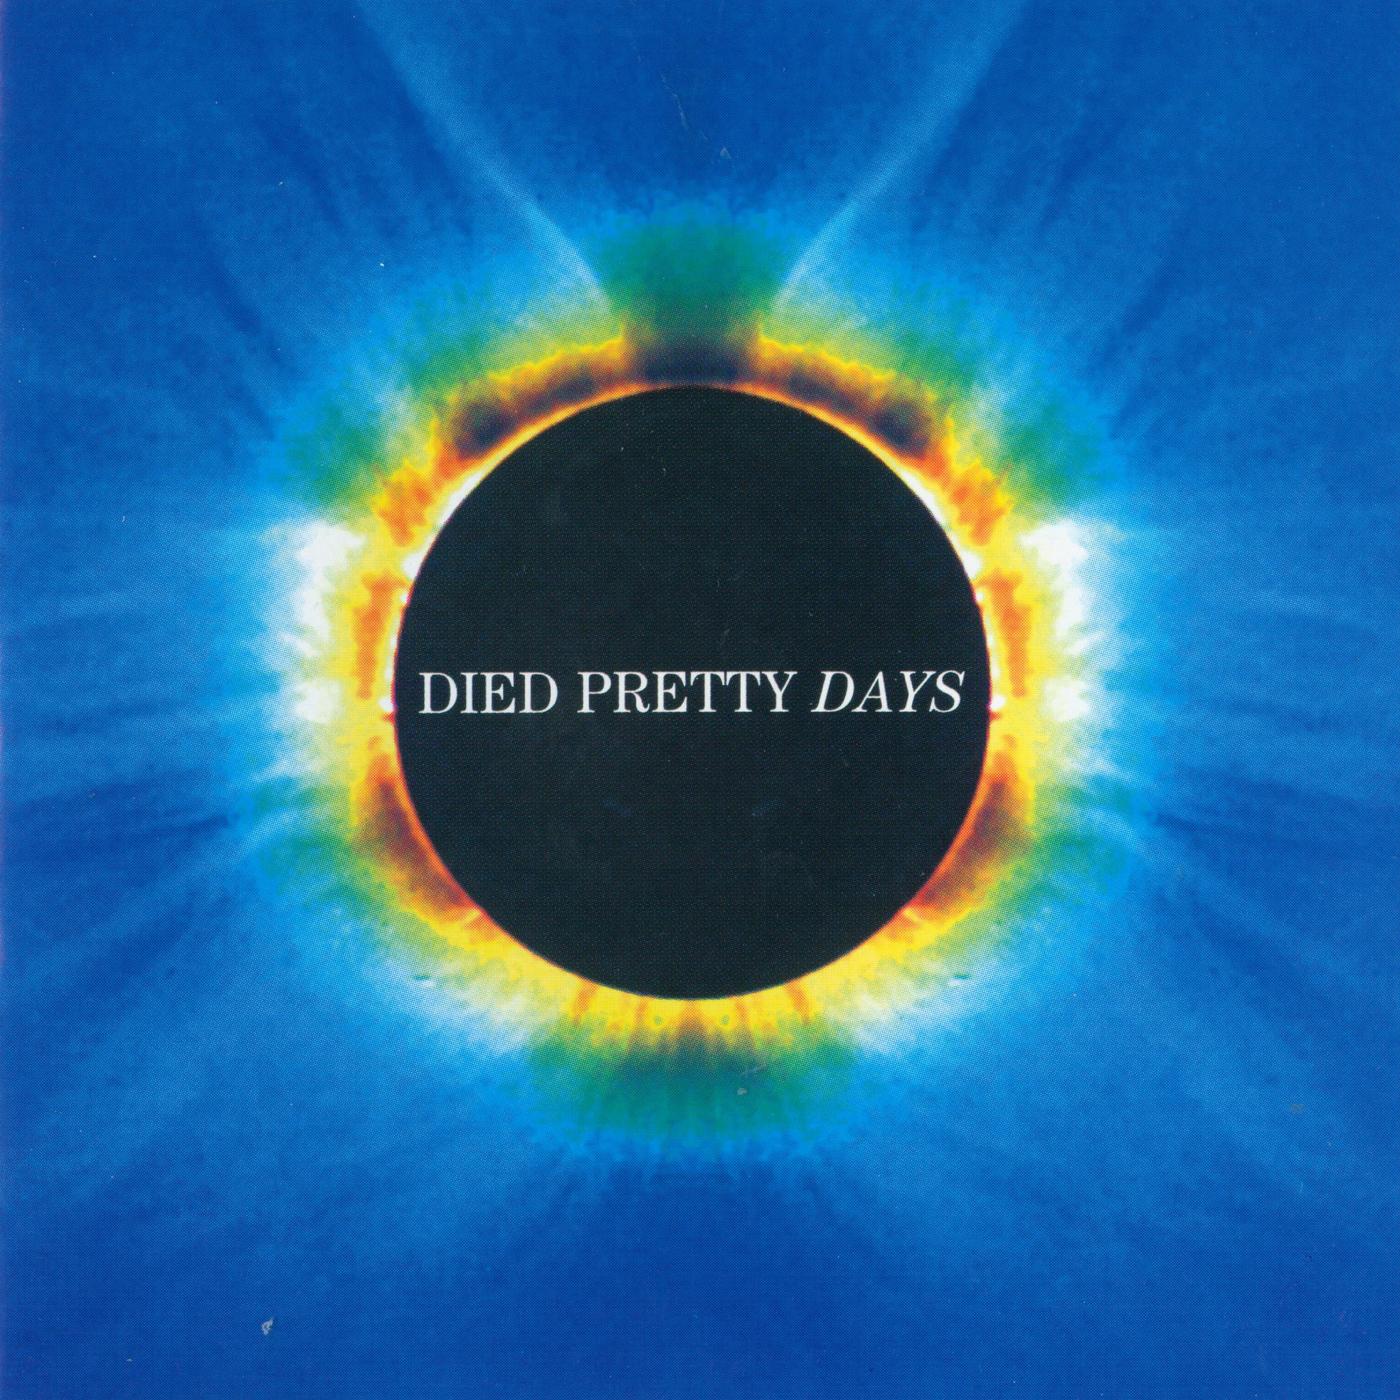 Days - Died Pretty